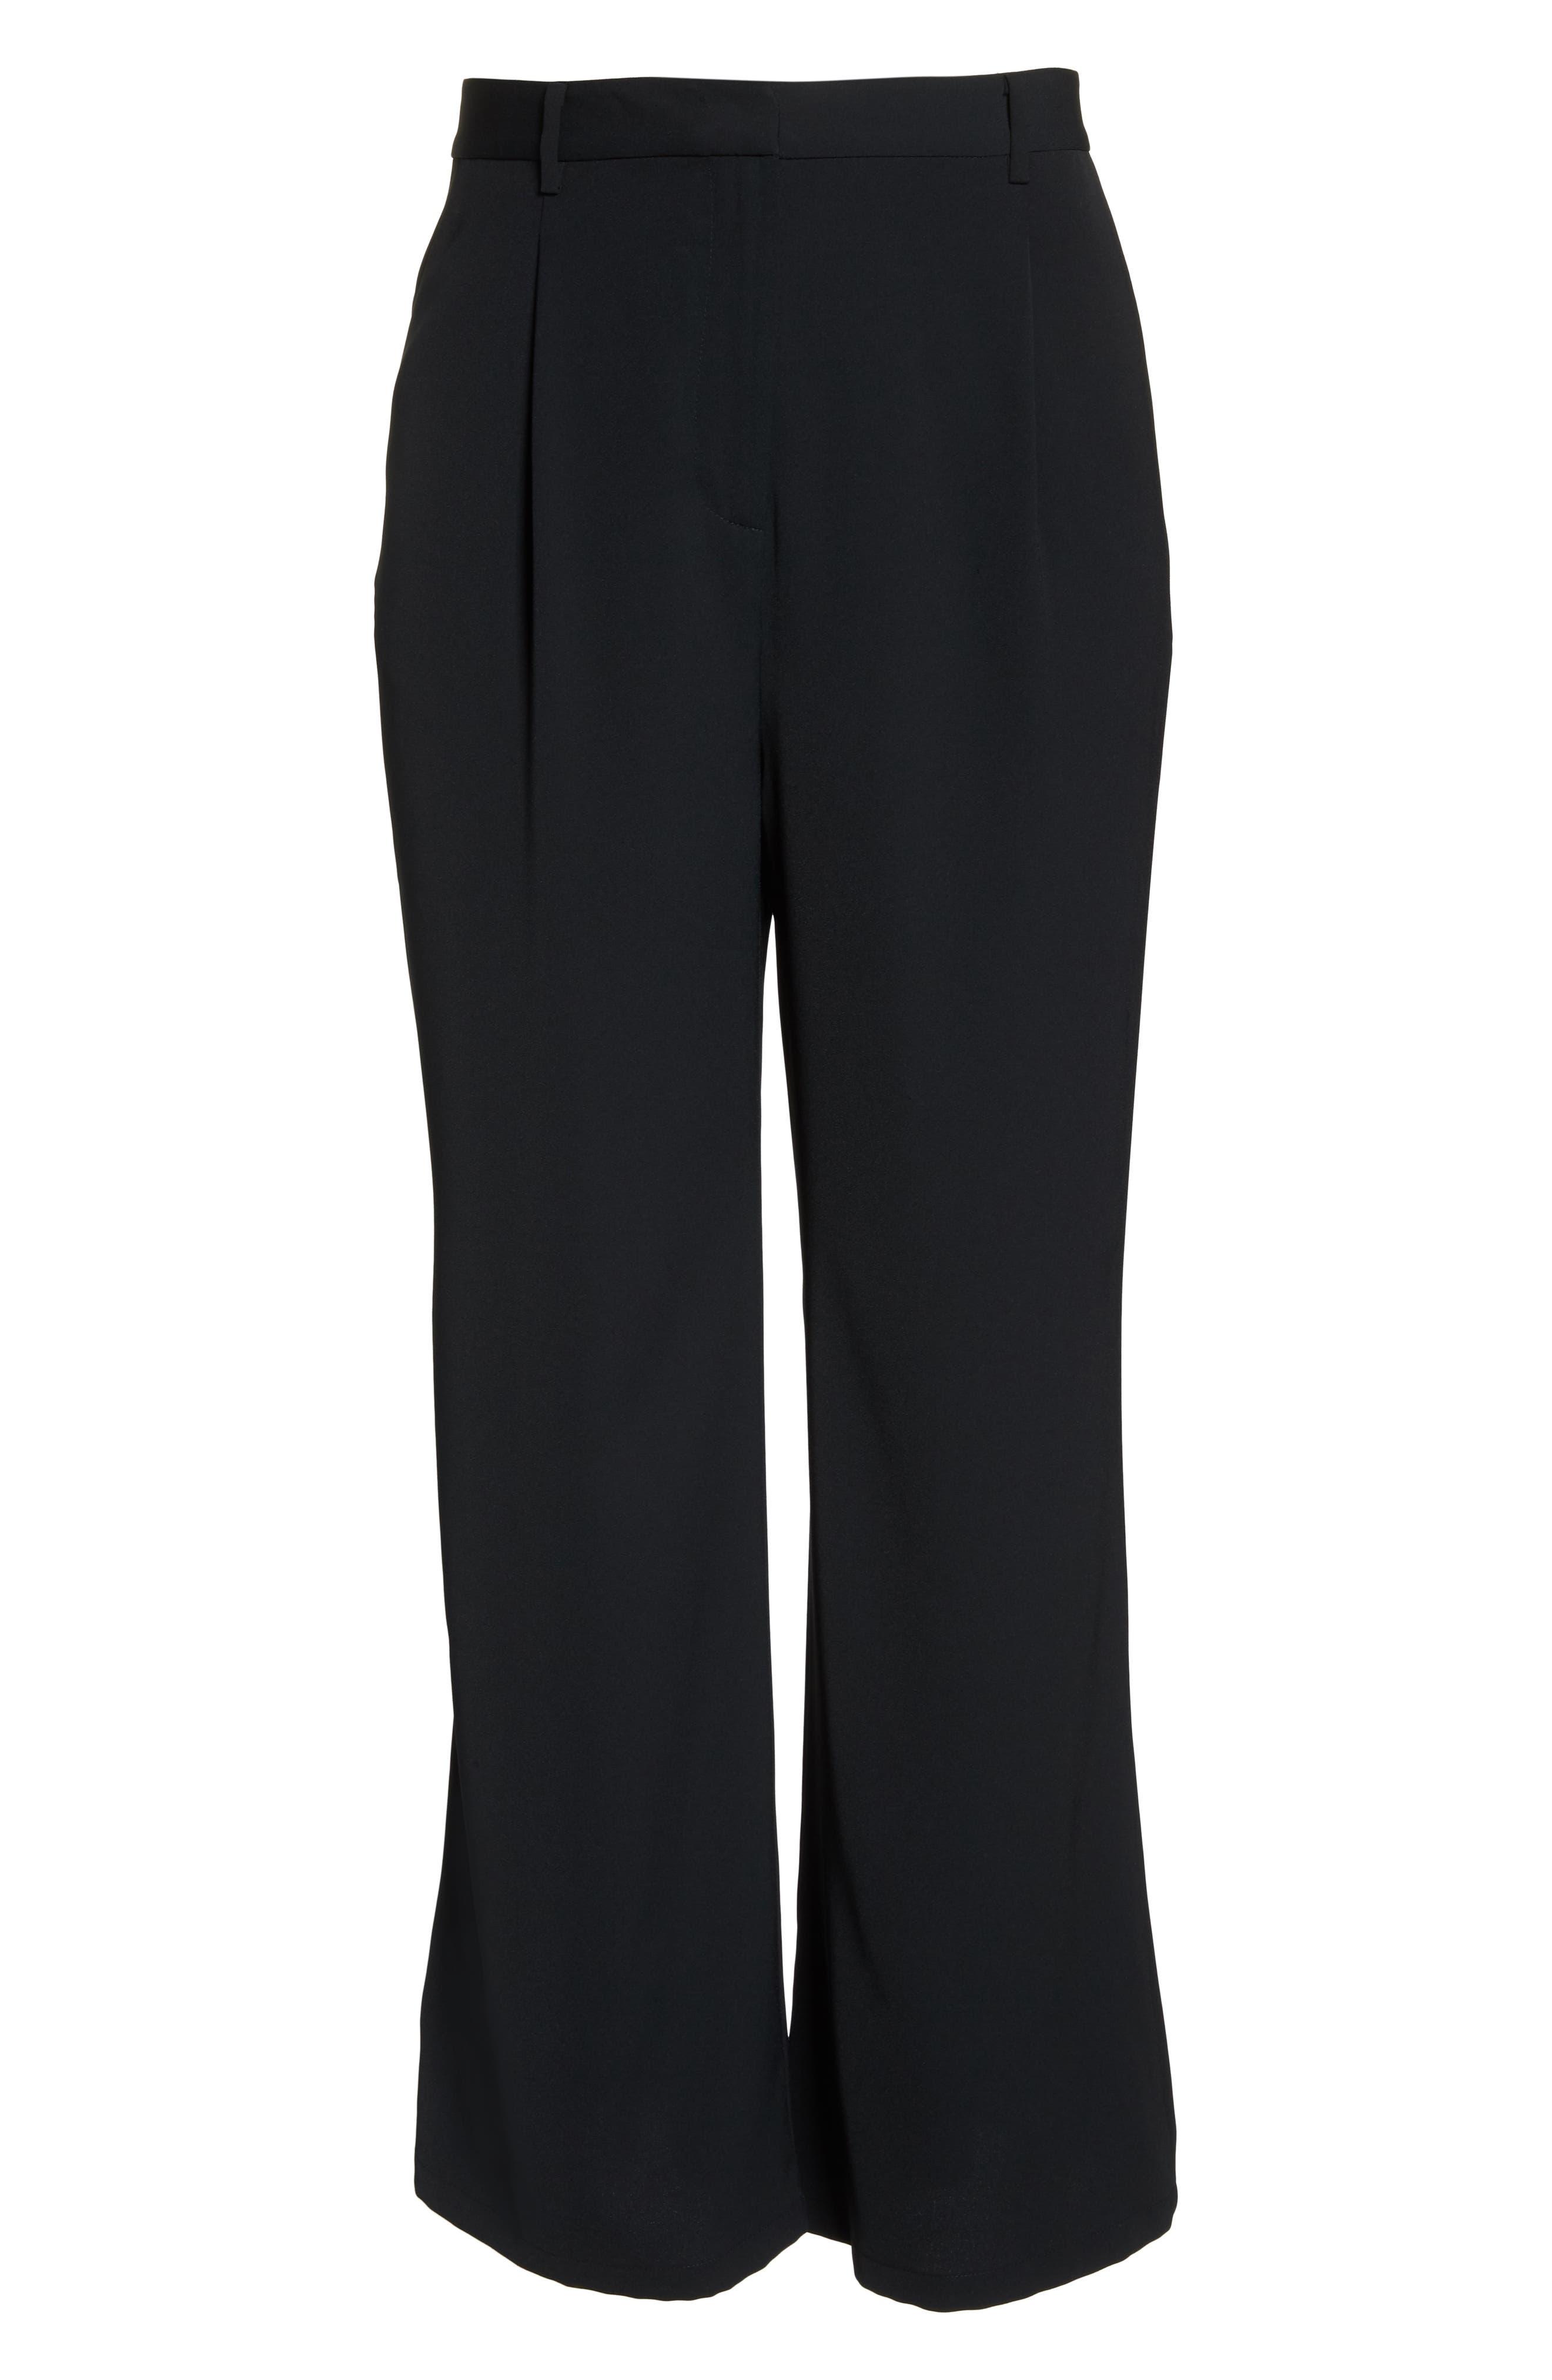 High Waist Flare Pants,                             Alternate thumbnail 12, color,                             BLACK